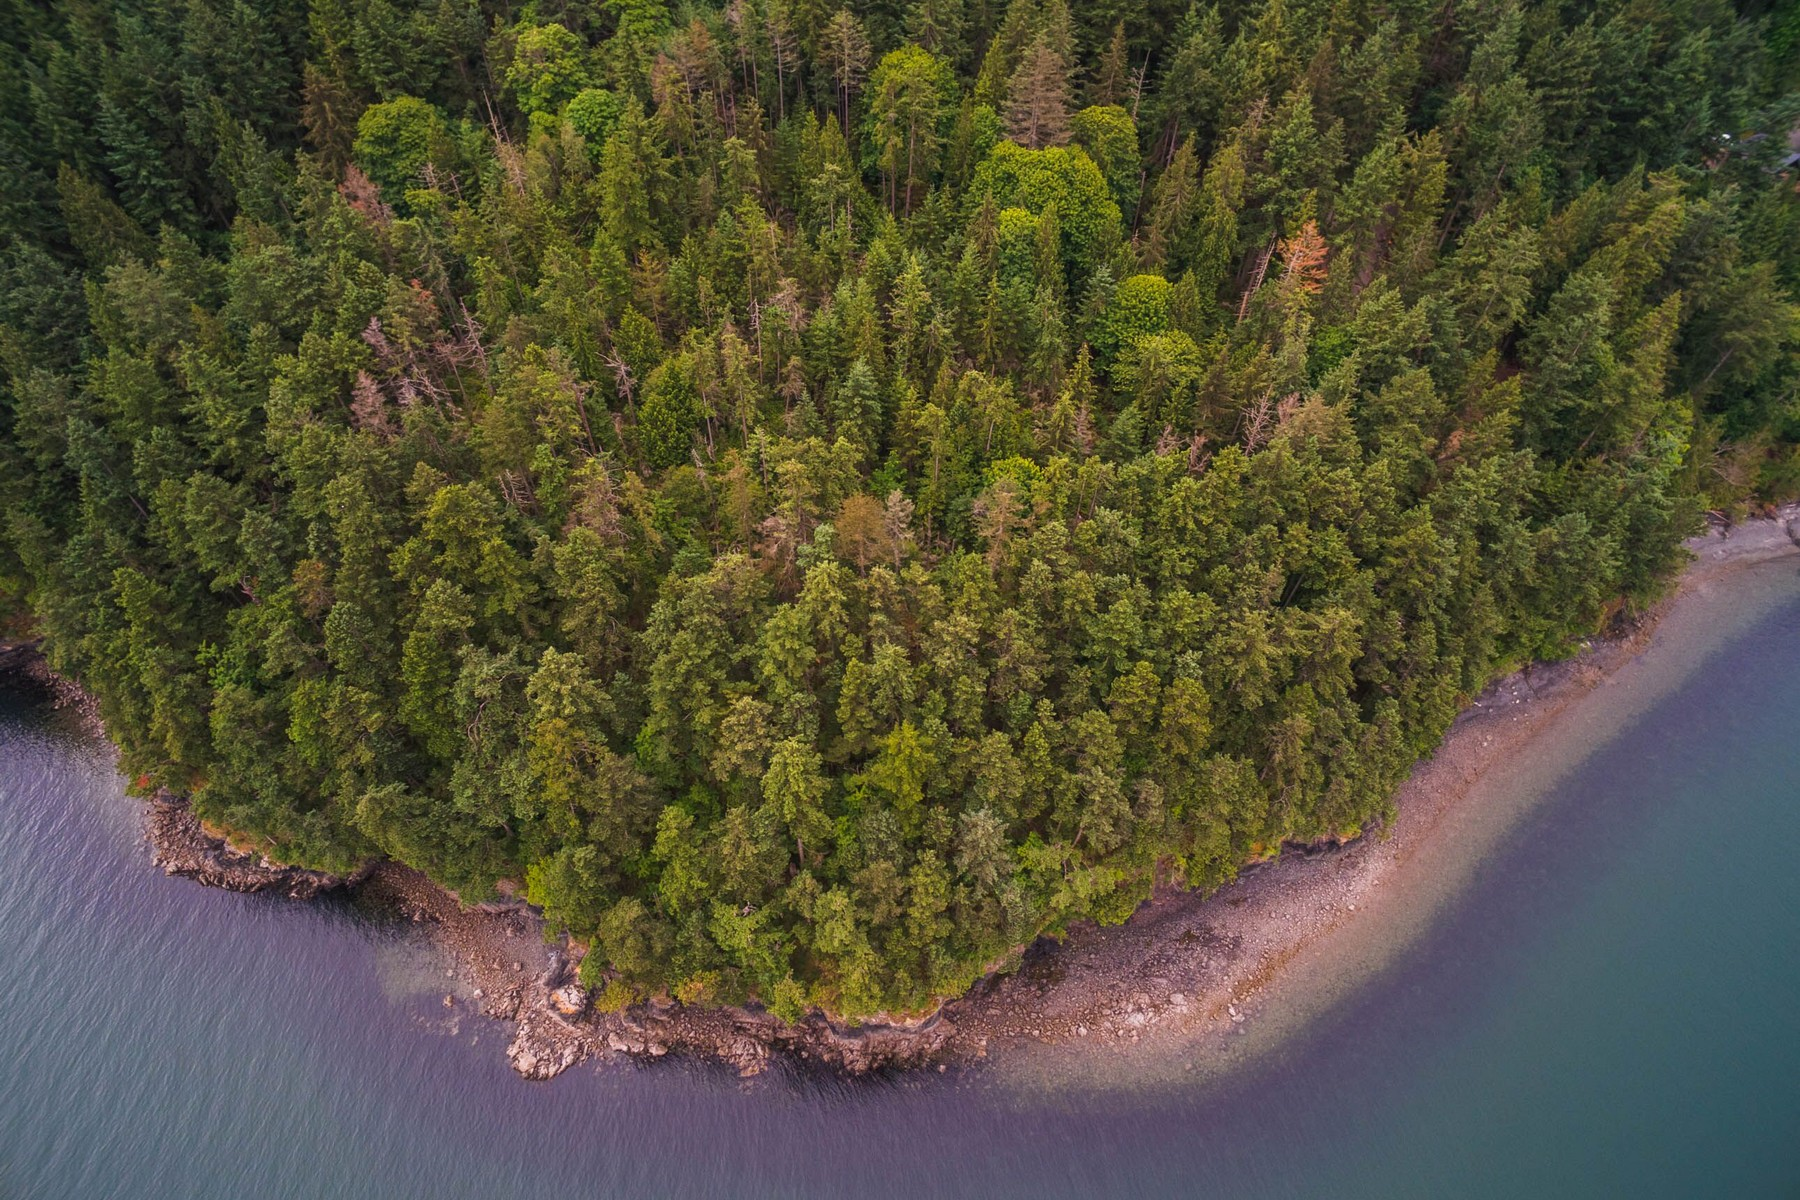 Đất đai vì Bán tại 13.87 Acres with 1360' of waterfront on Lummi Island Seacrest Drive Lummi Island, Washington, 98262 Hoa Kỳ